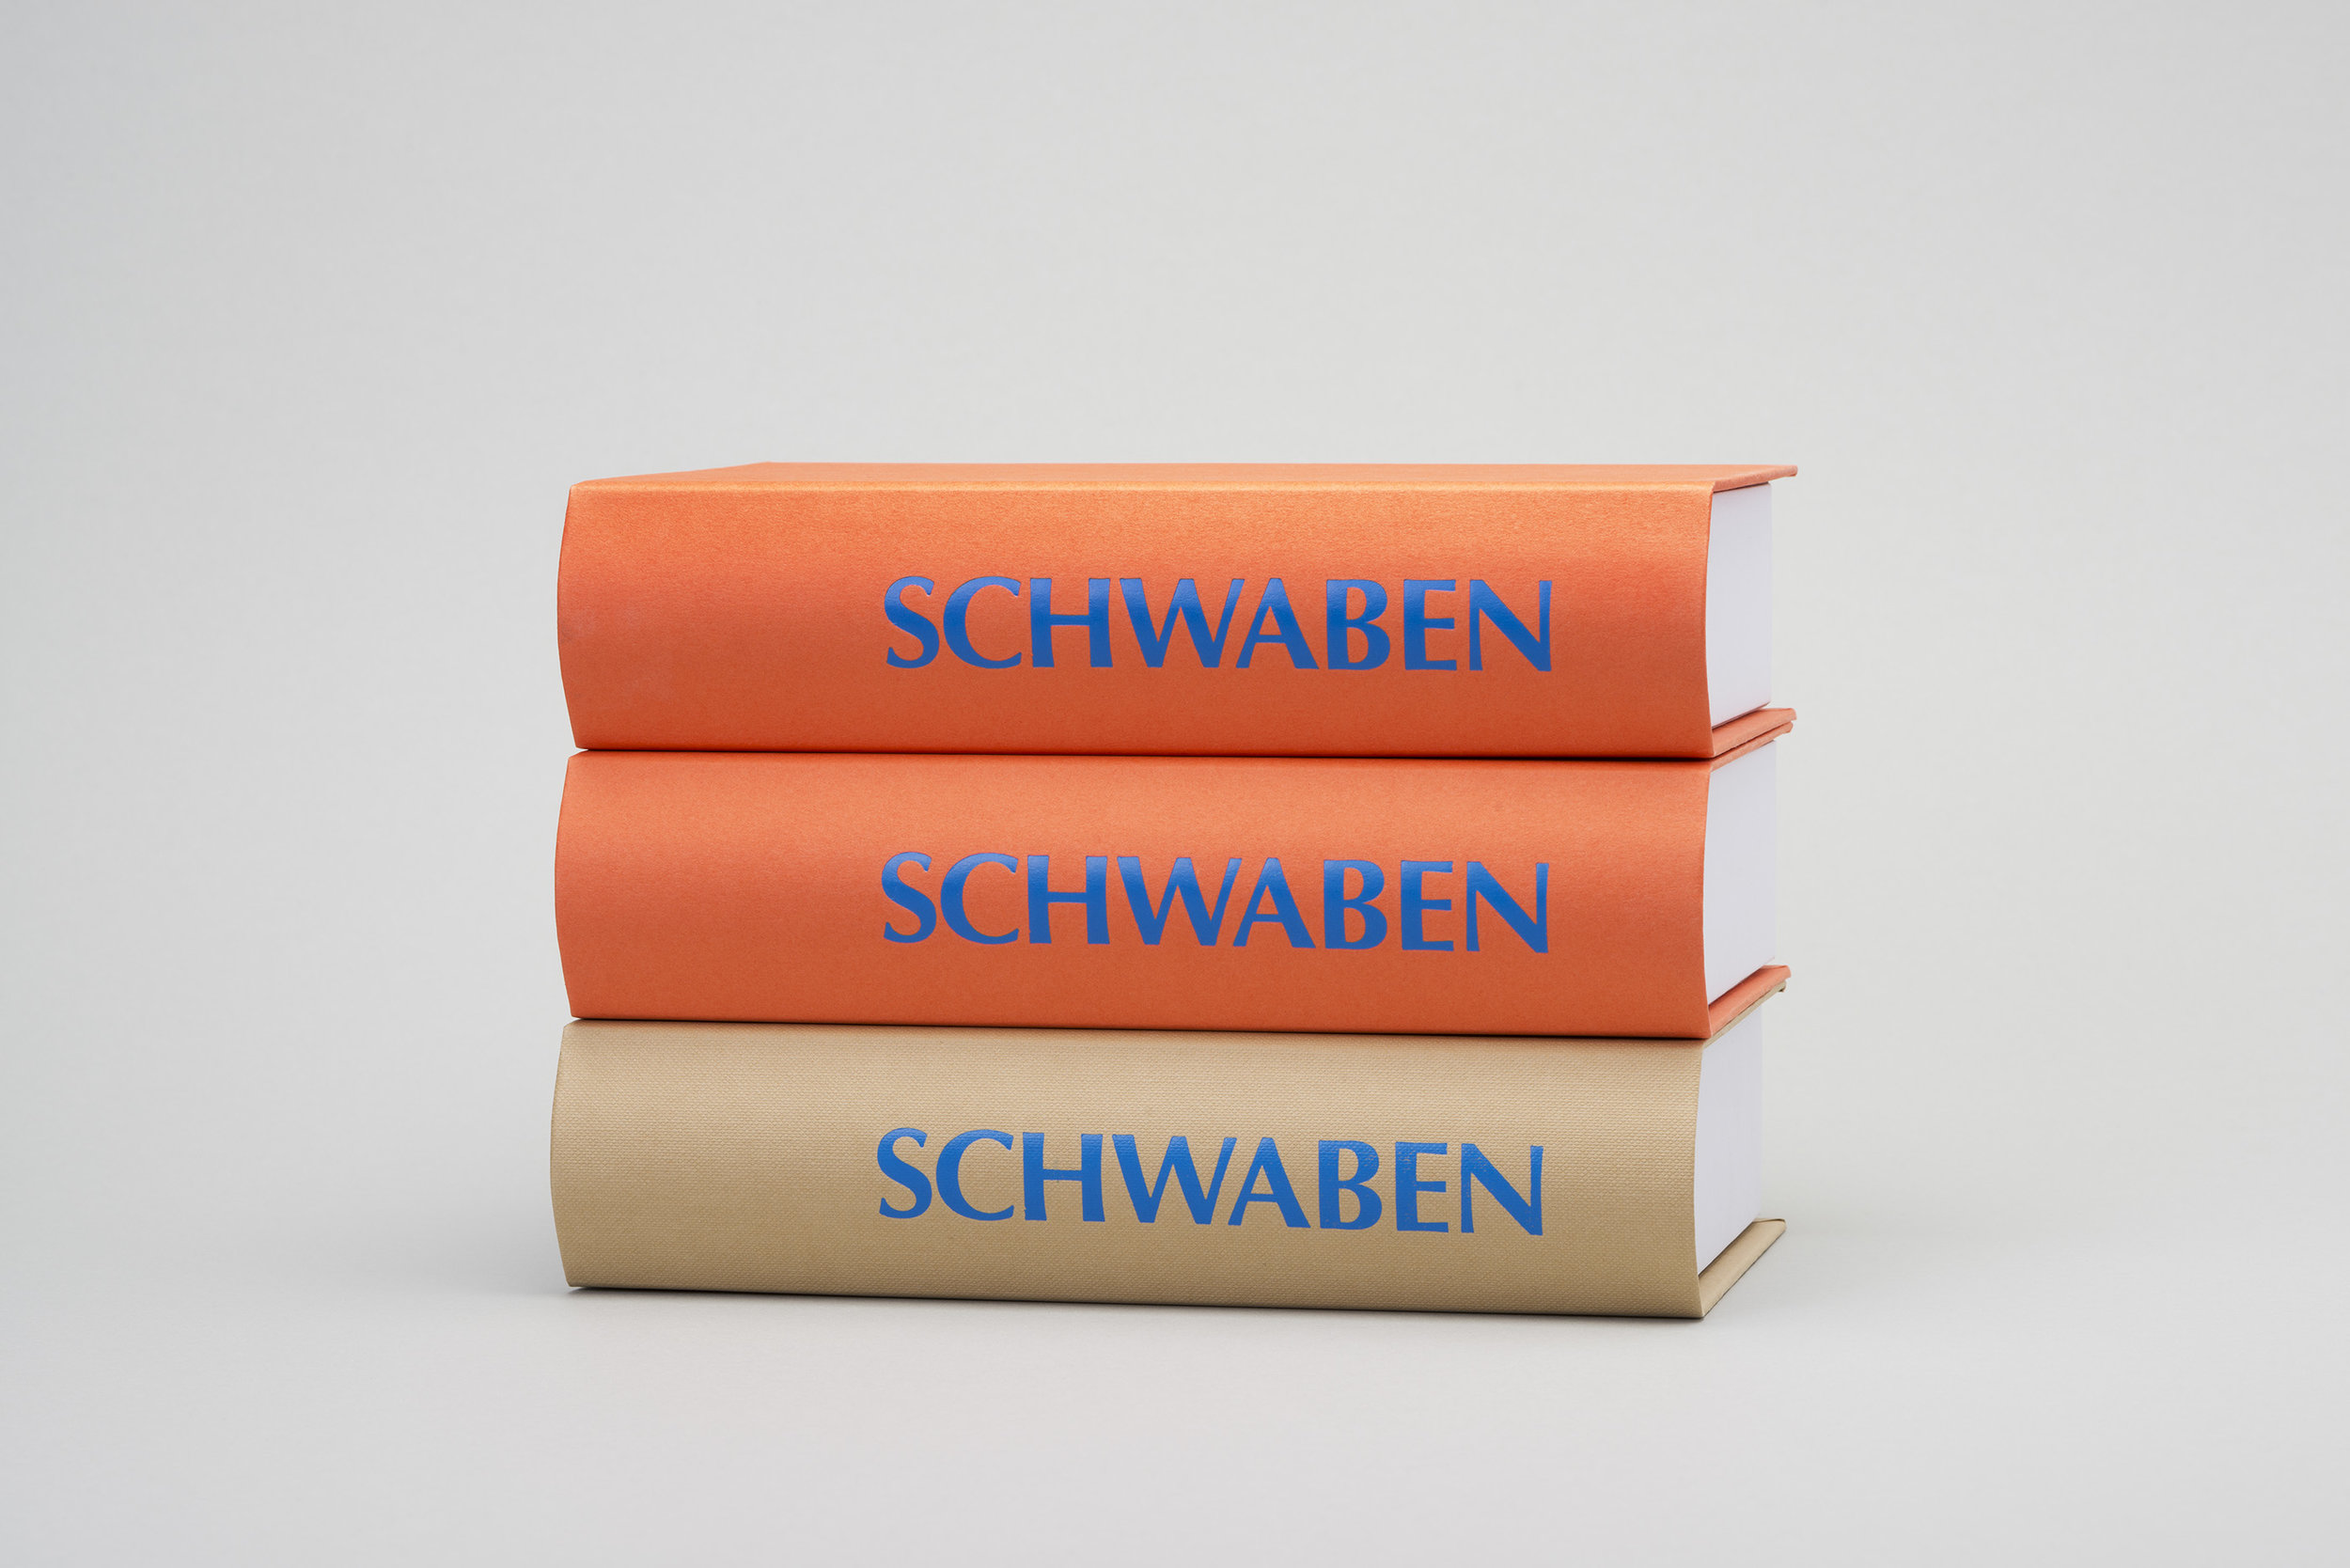 Triple Schwaben , 2017 Chromogenic print 13 3/16 x 19 7/8 inches